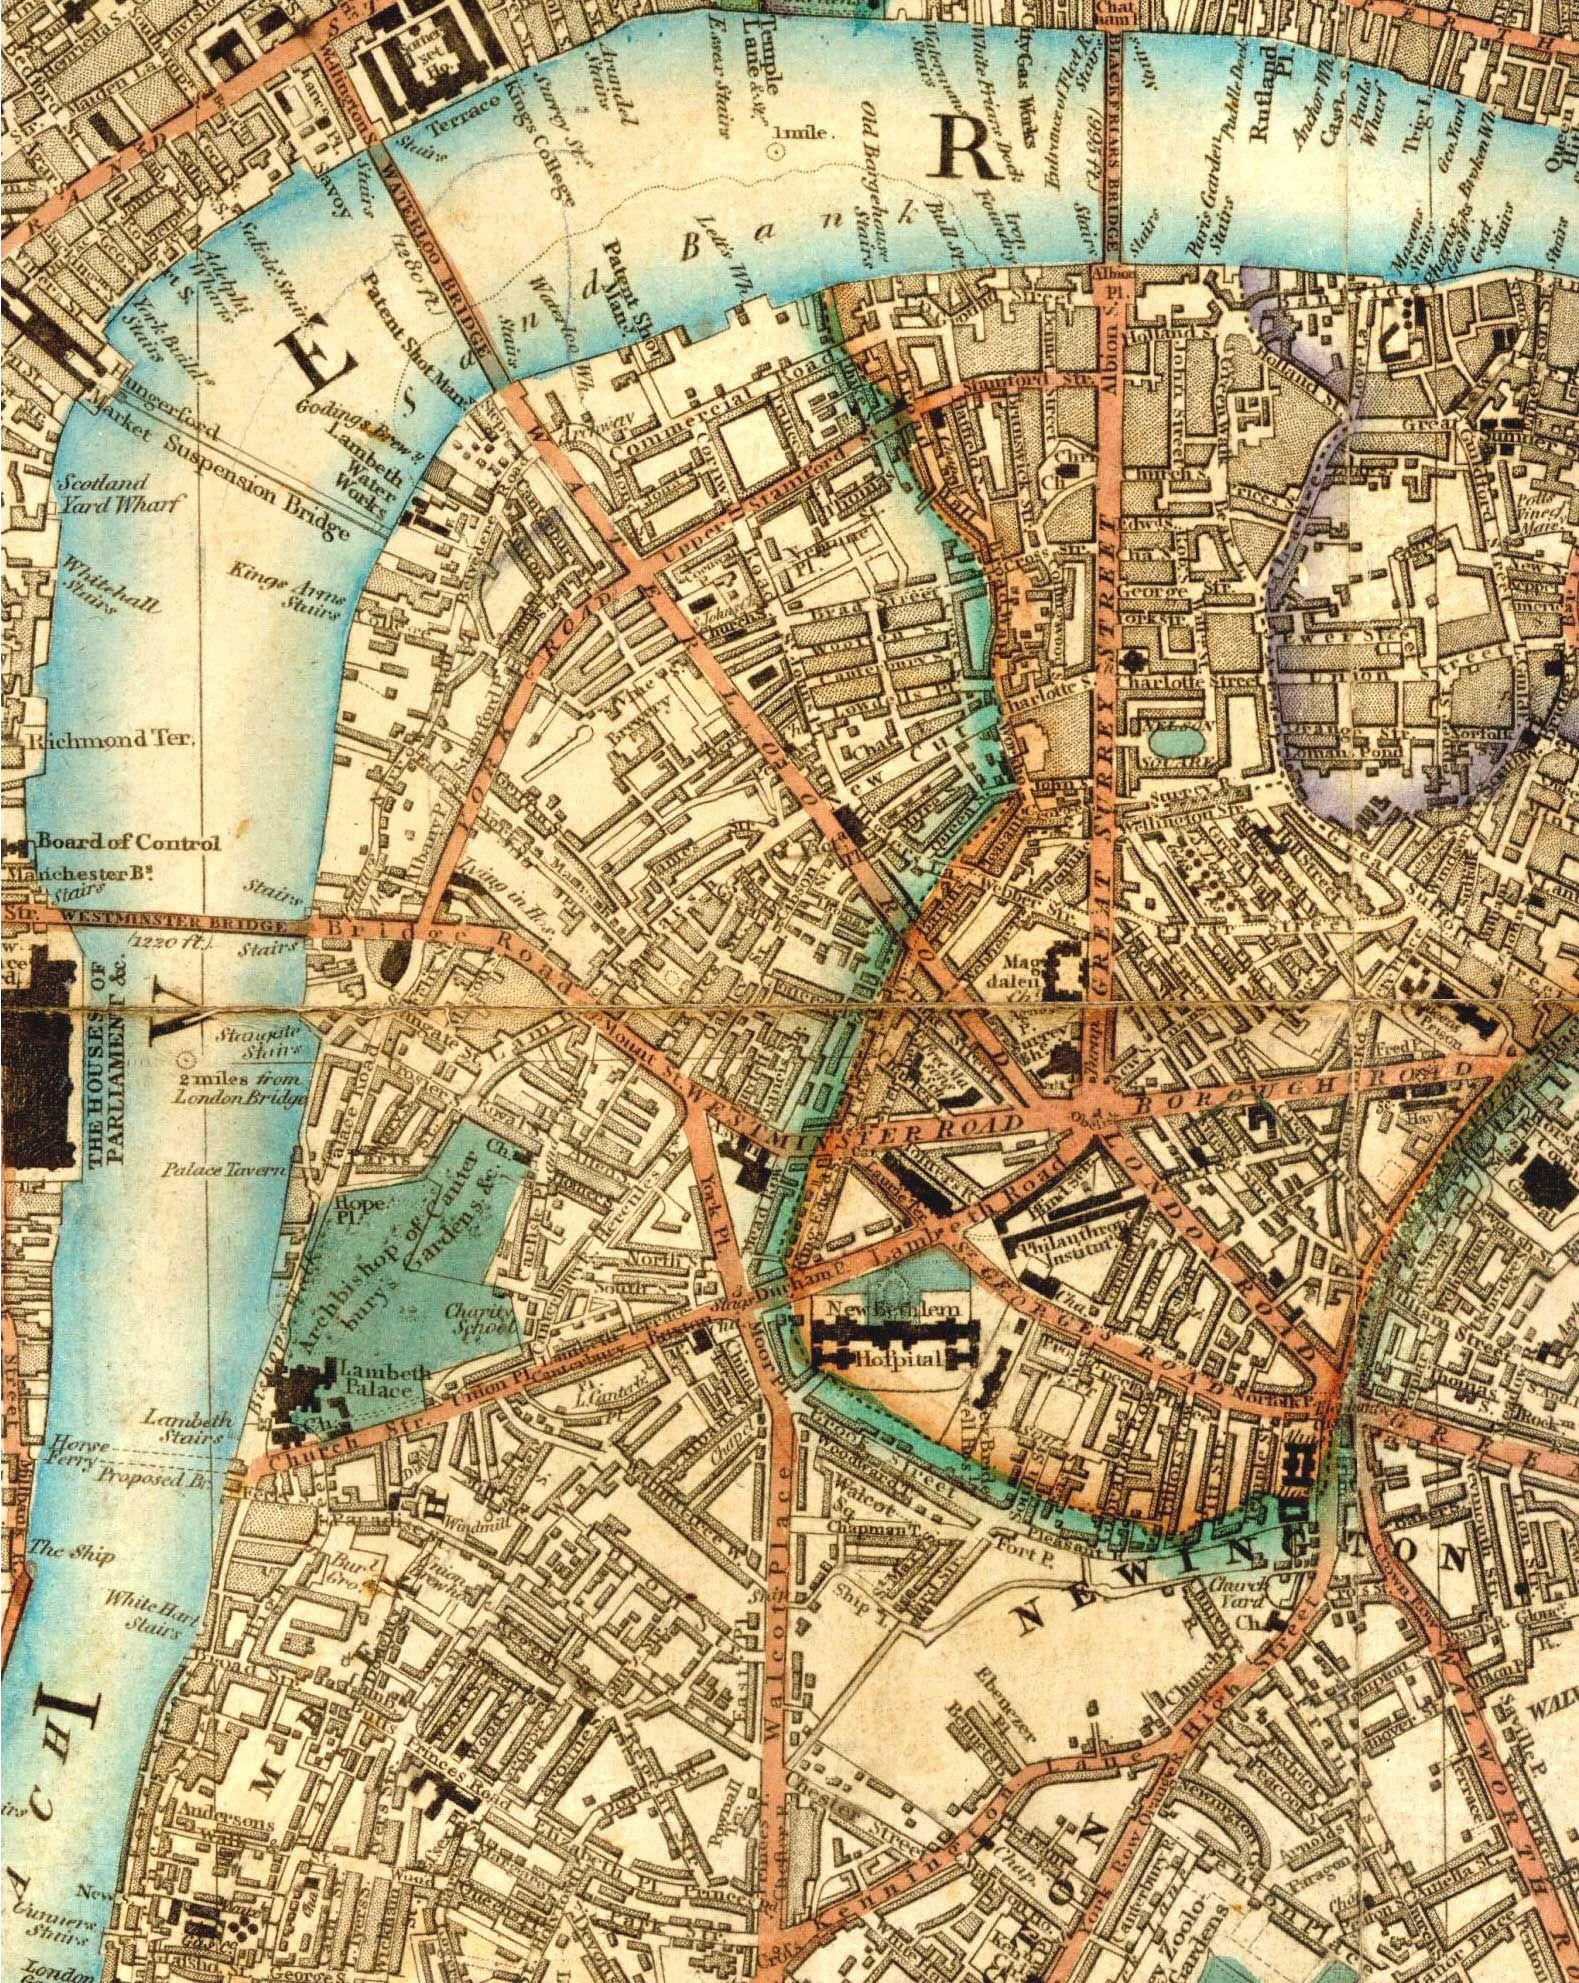 1844 Map of Lambeth North and Waterloo Southwark London I love